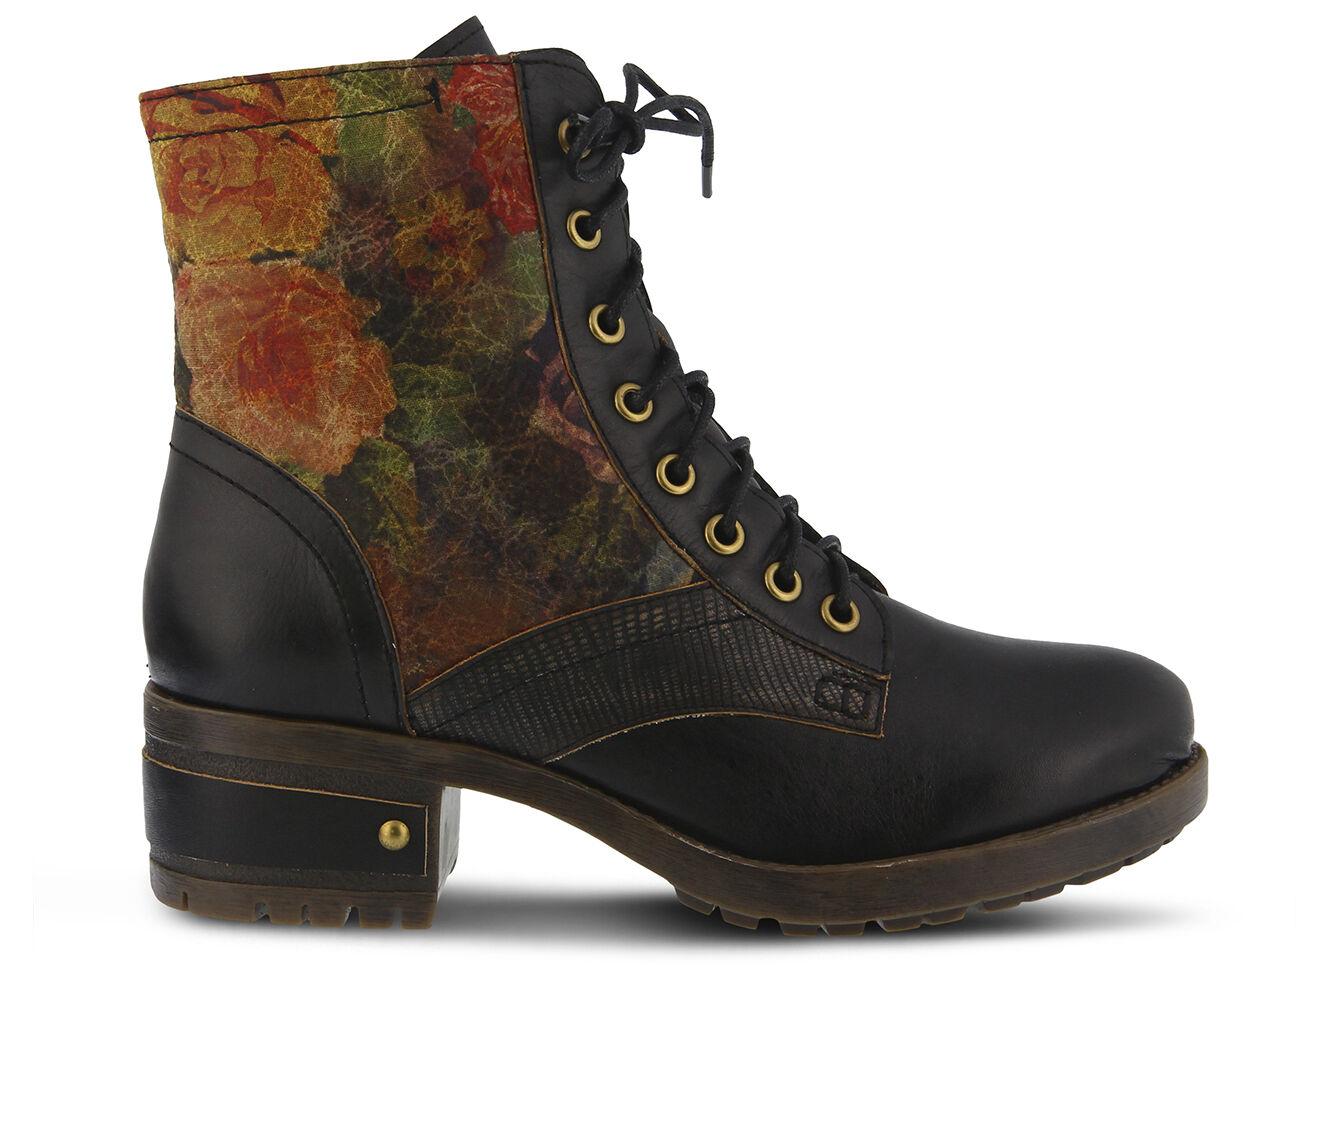 easy returns Women's L'ARTISTE Marty Hiking Boots Black